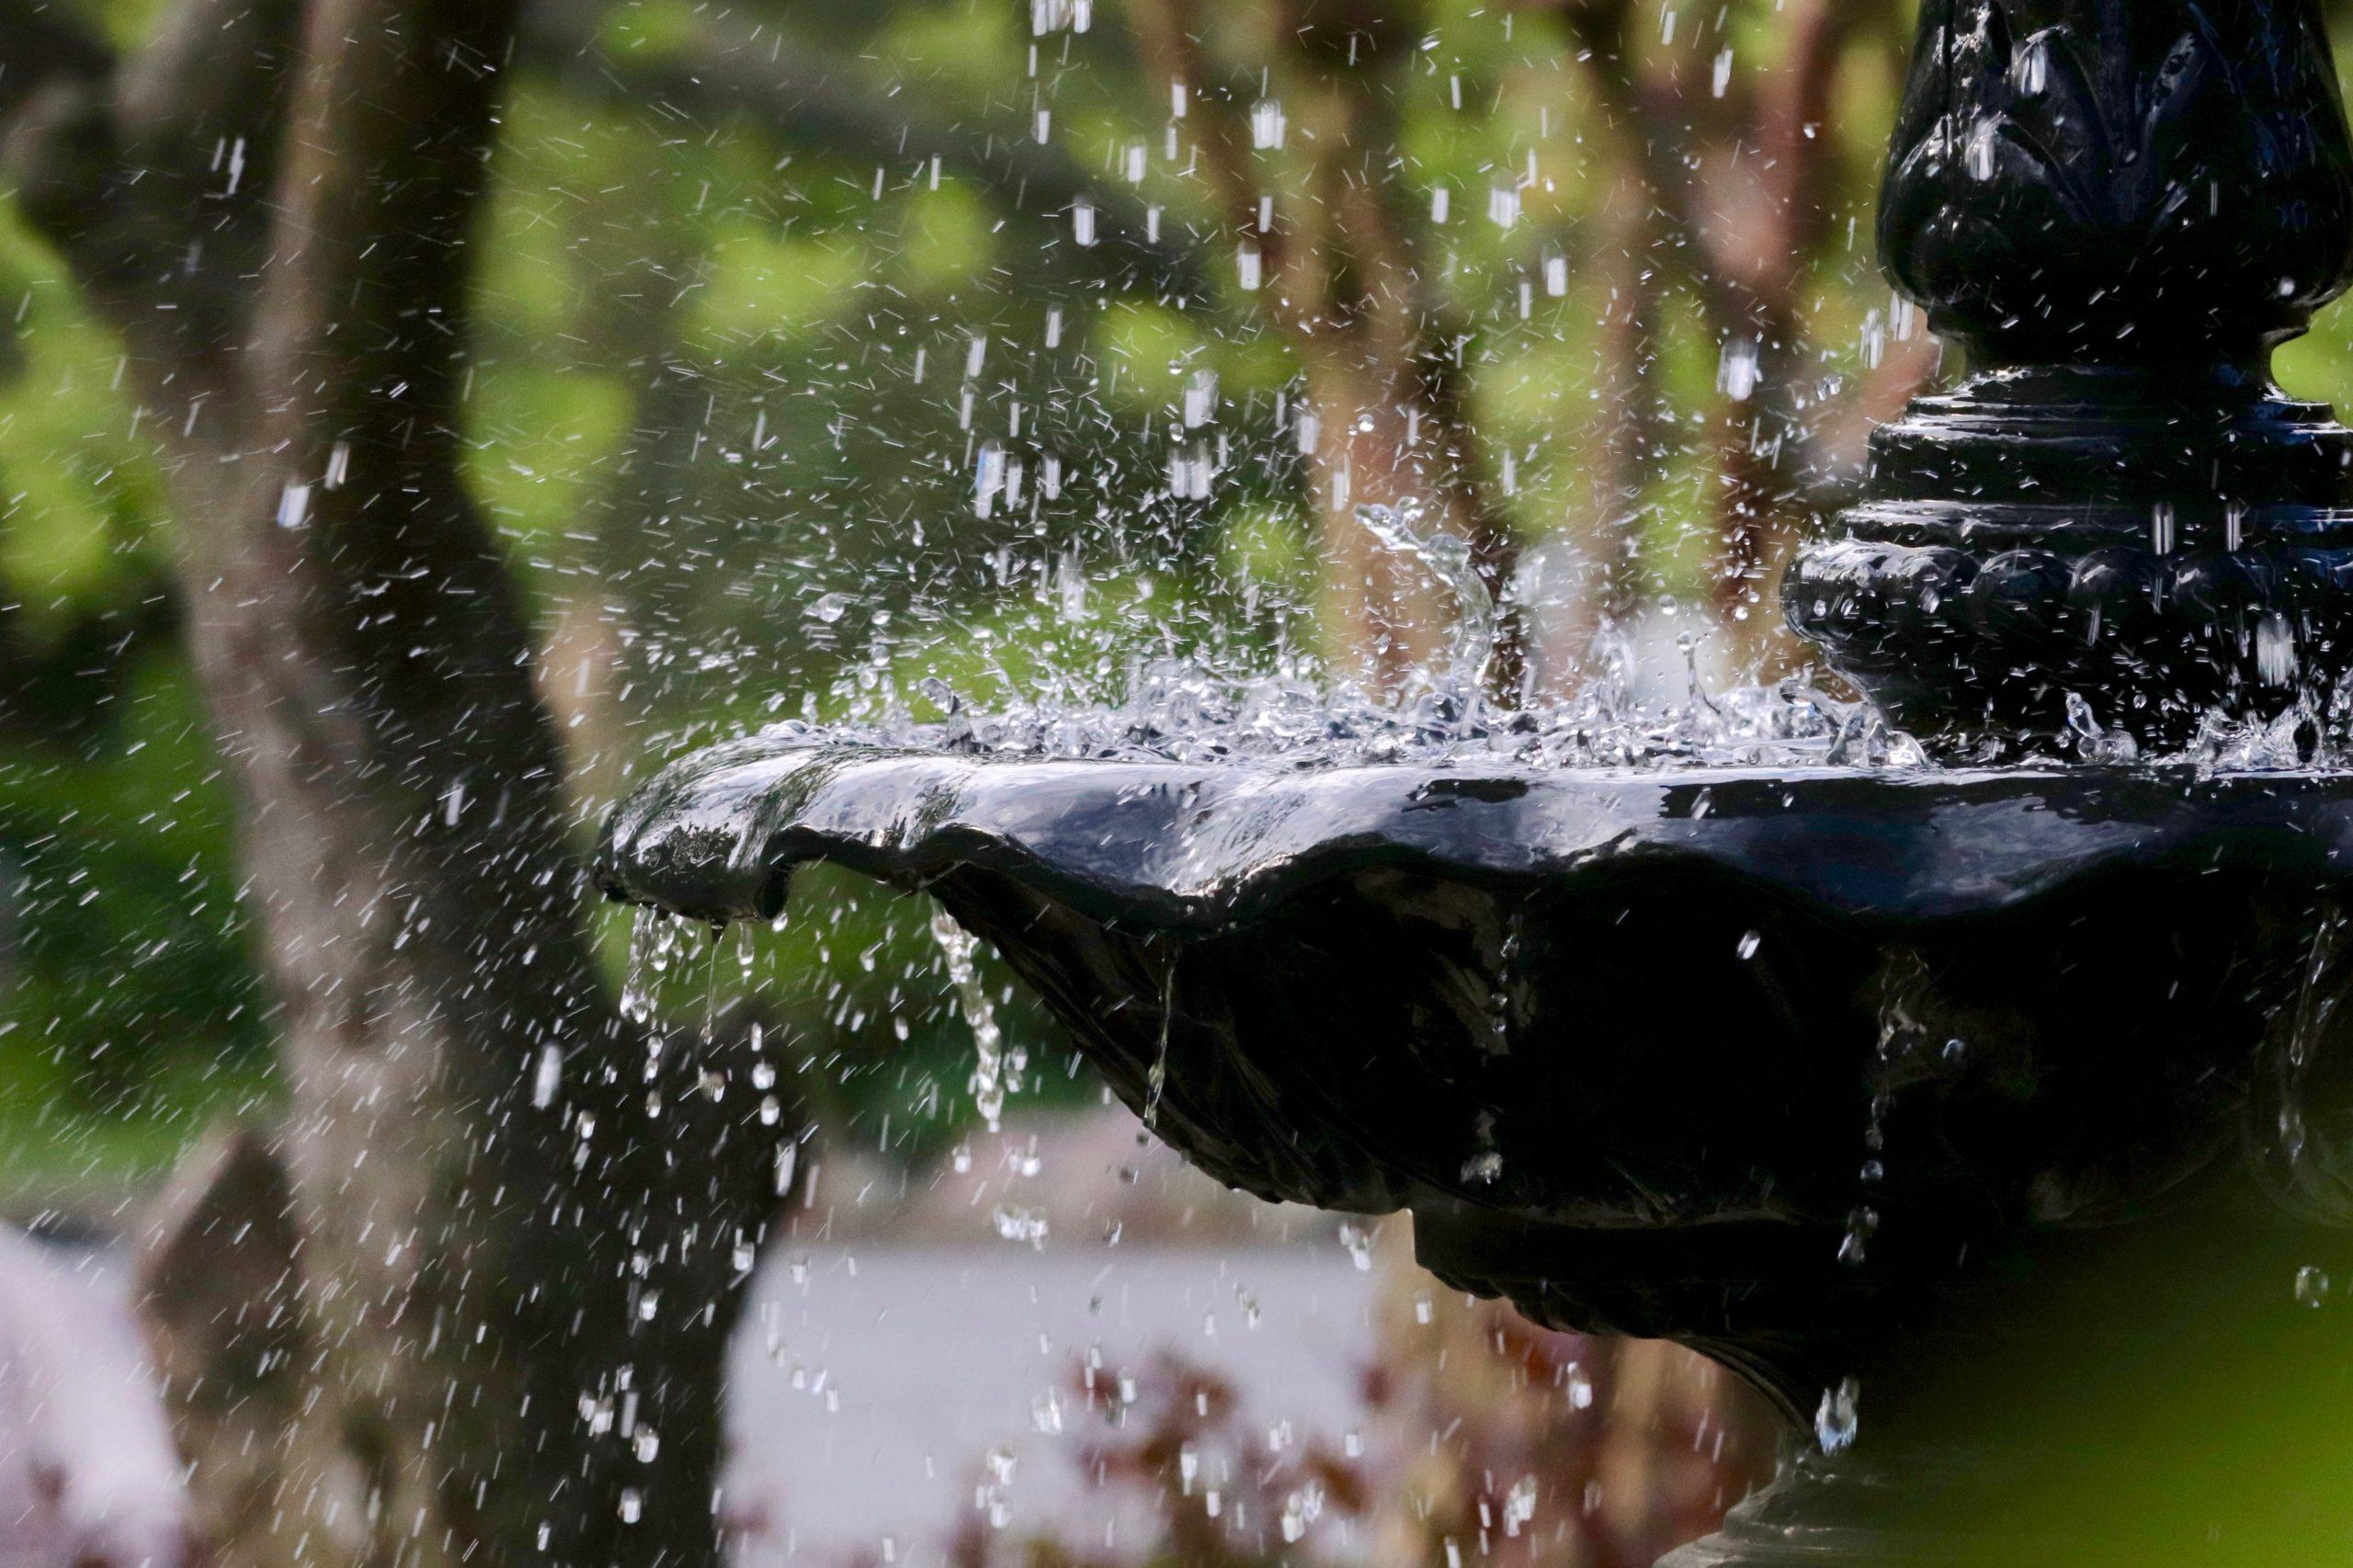 Take a break. Stare into the fountain. It helps.